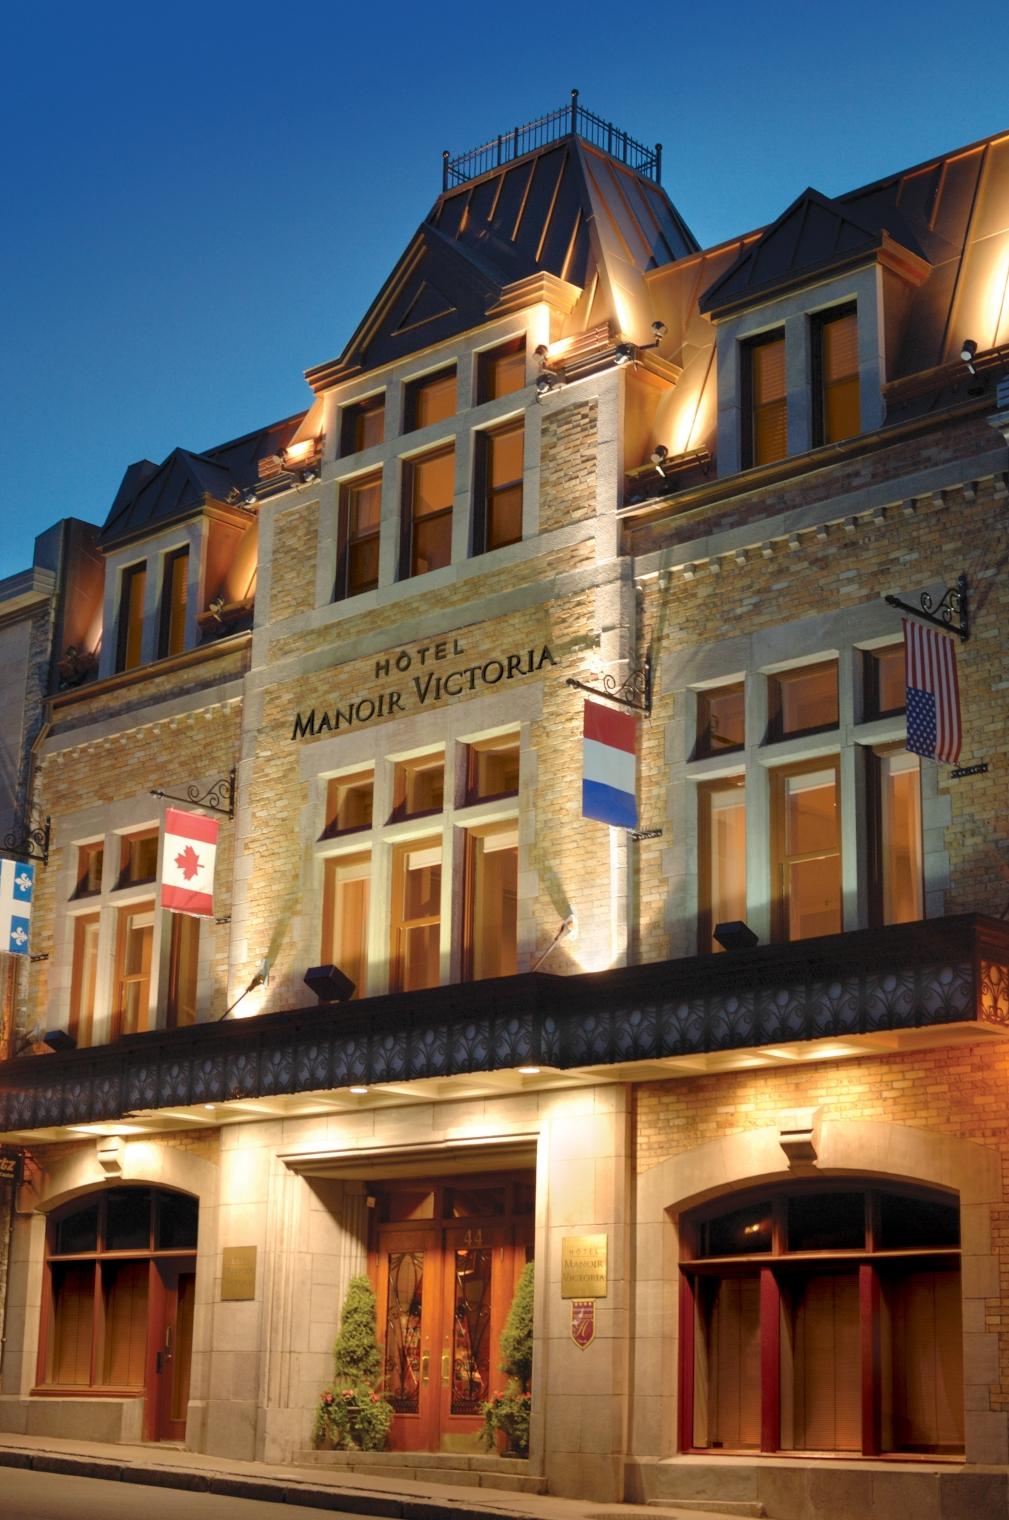 Hotel manoir victoria quebec city canadian affair for Design hotel quebec